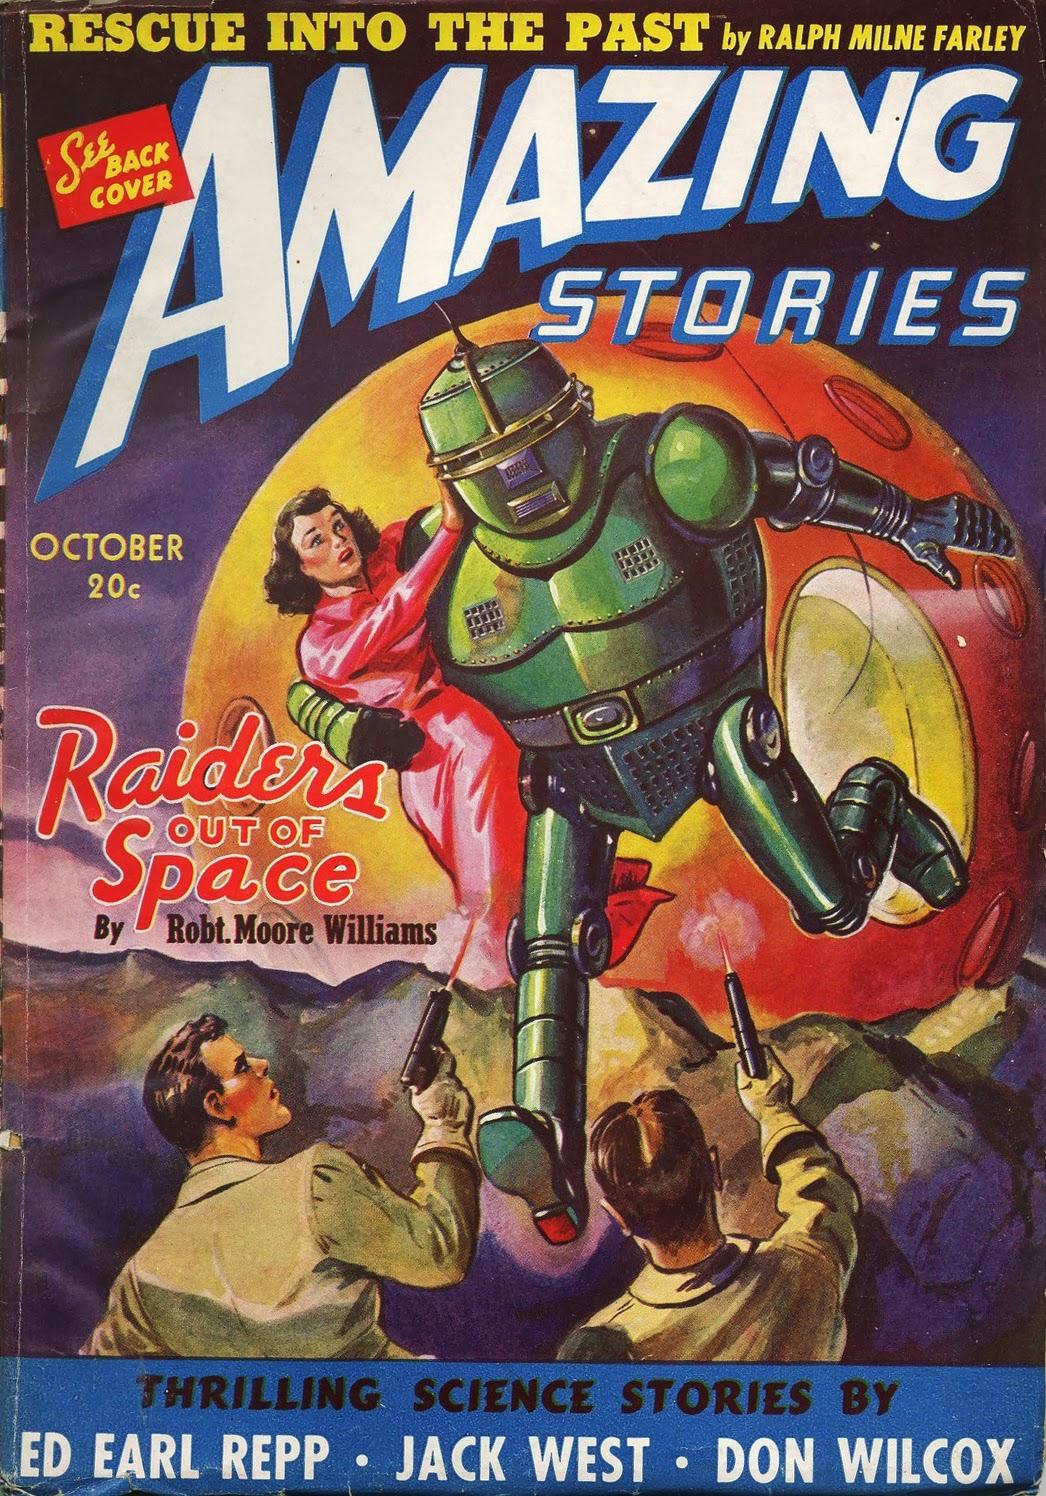 Amazing Stories Volume 21 Number 06: Ski-Ffy: AMAZING STORIES, OCTOBER 1940